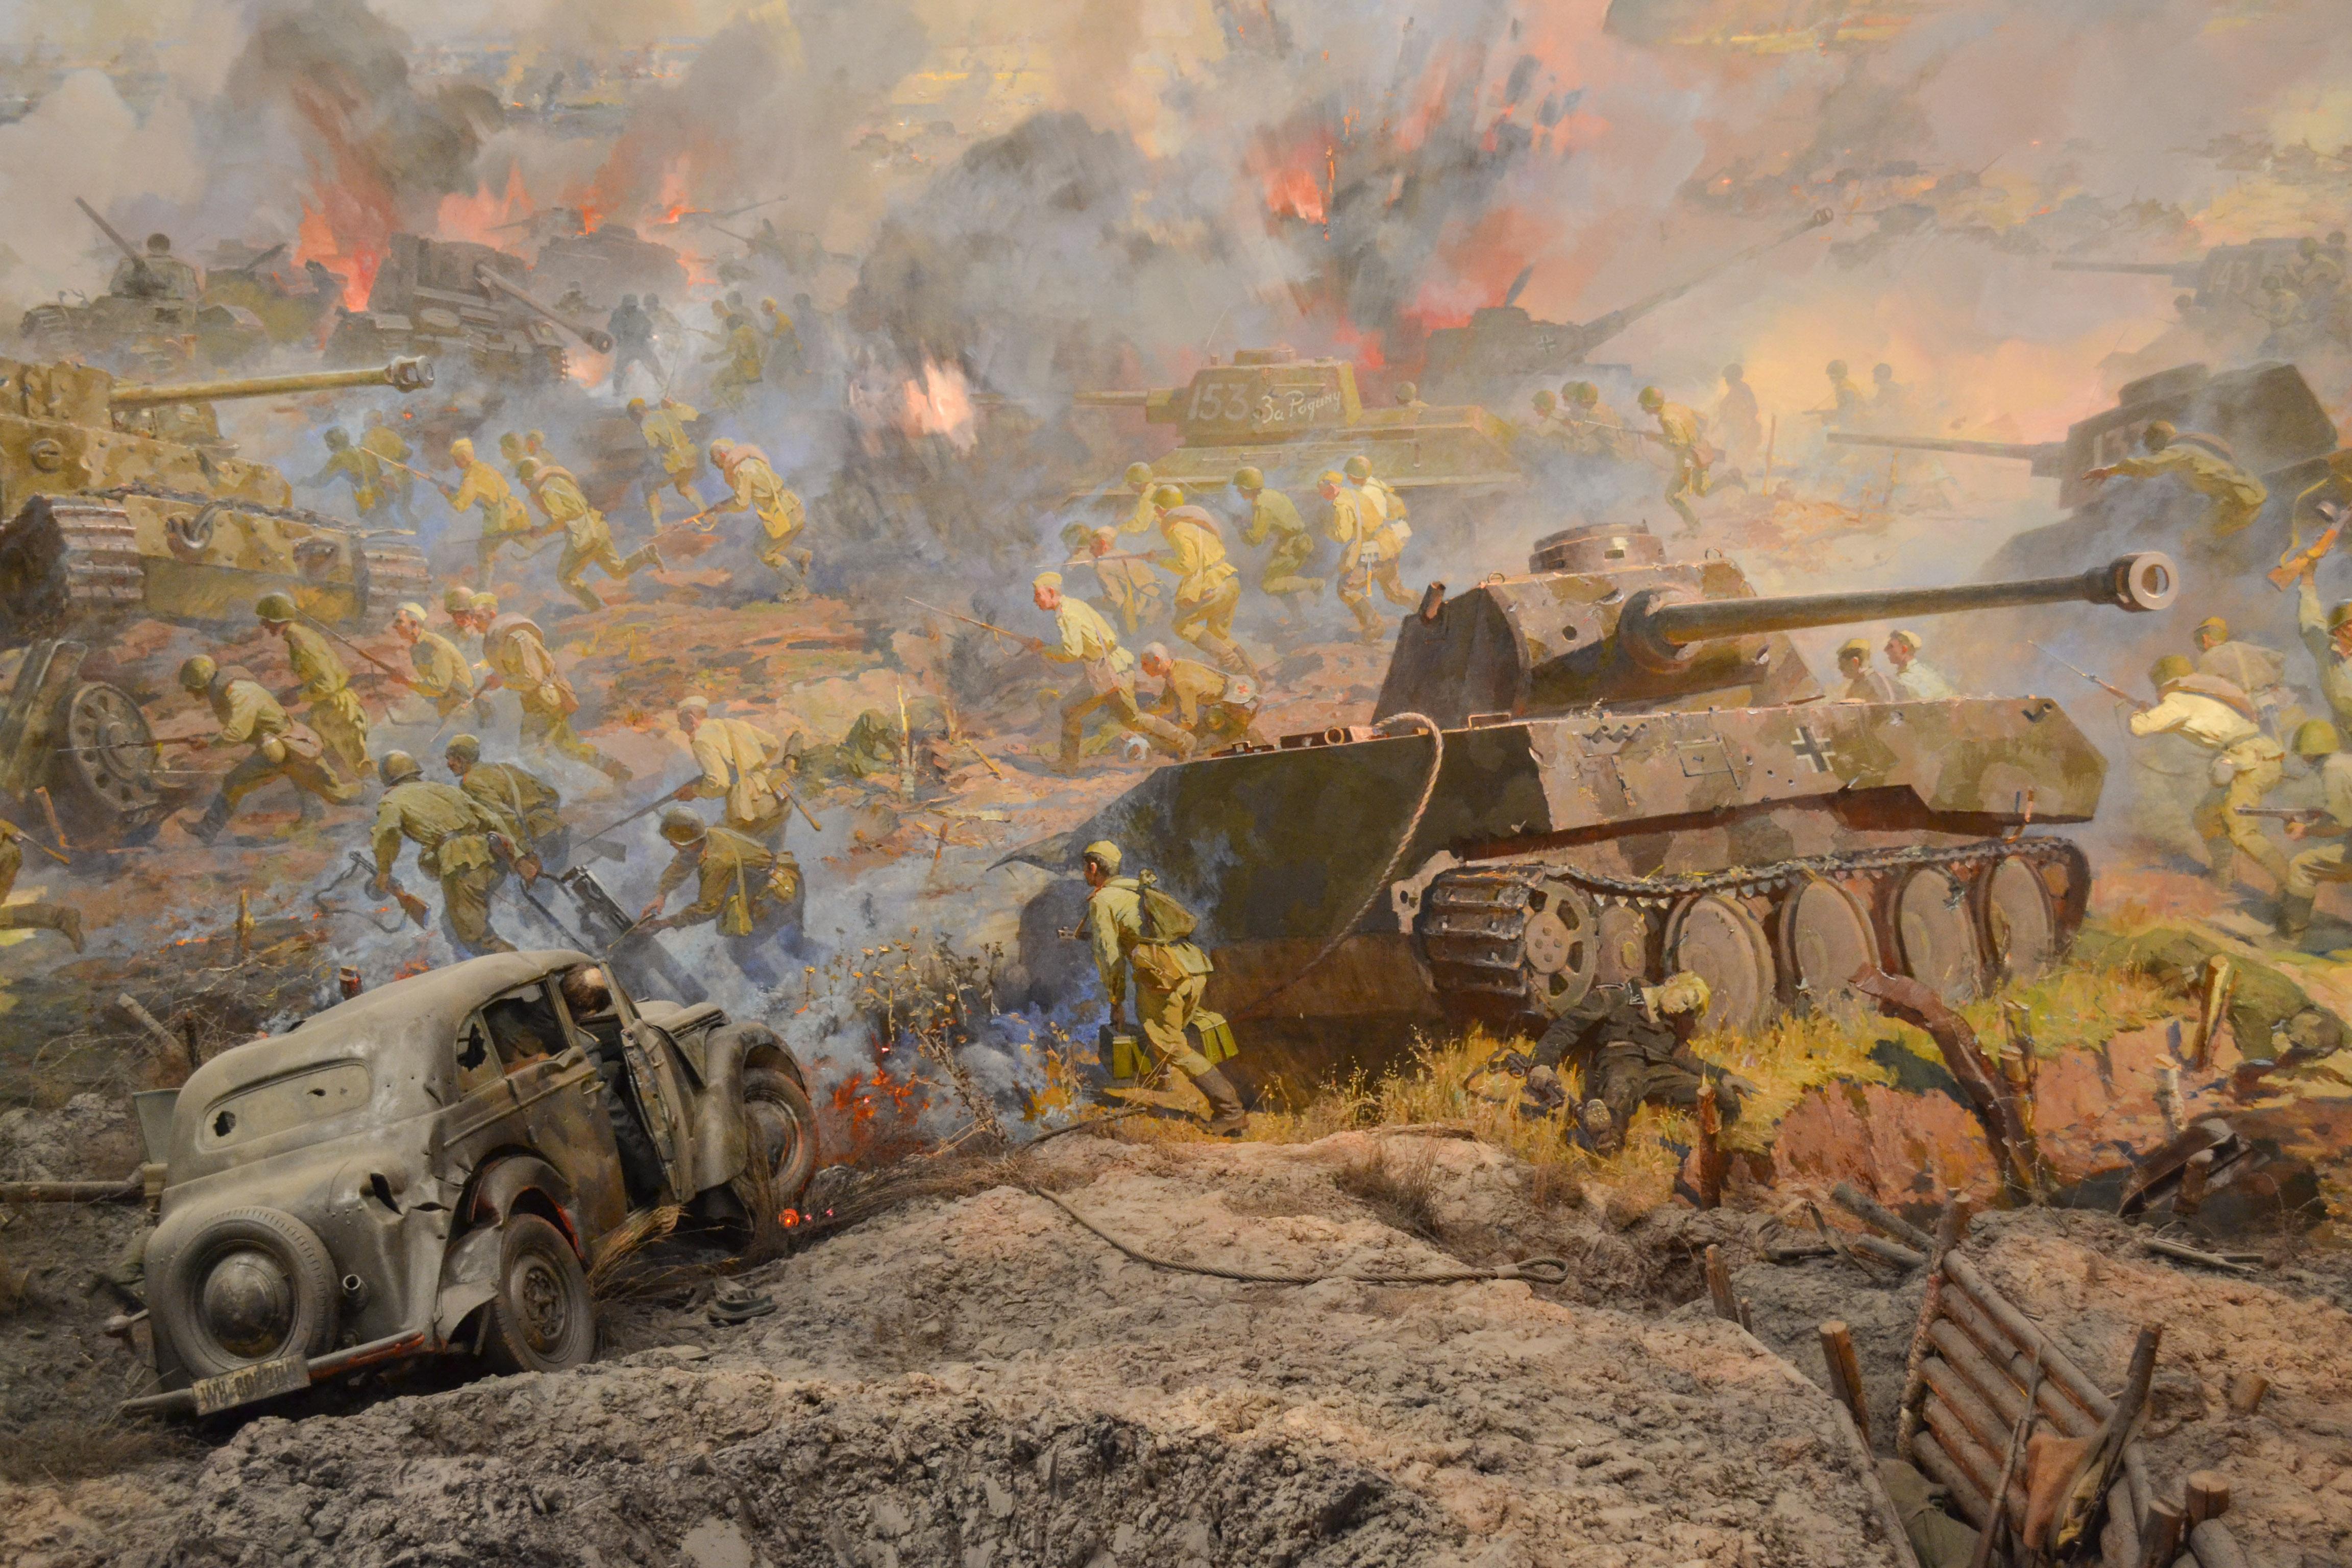 Фото танков белгородского музея диорамы поняли